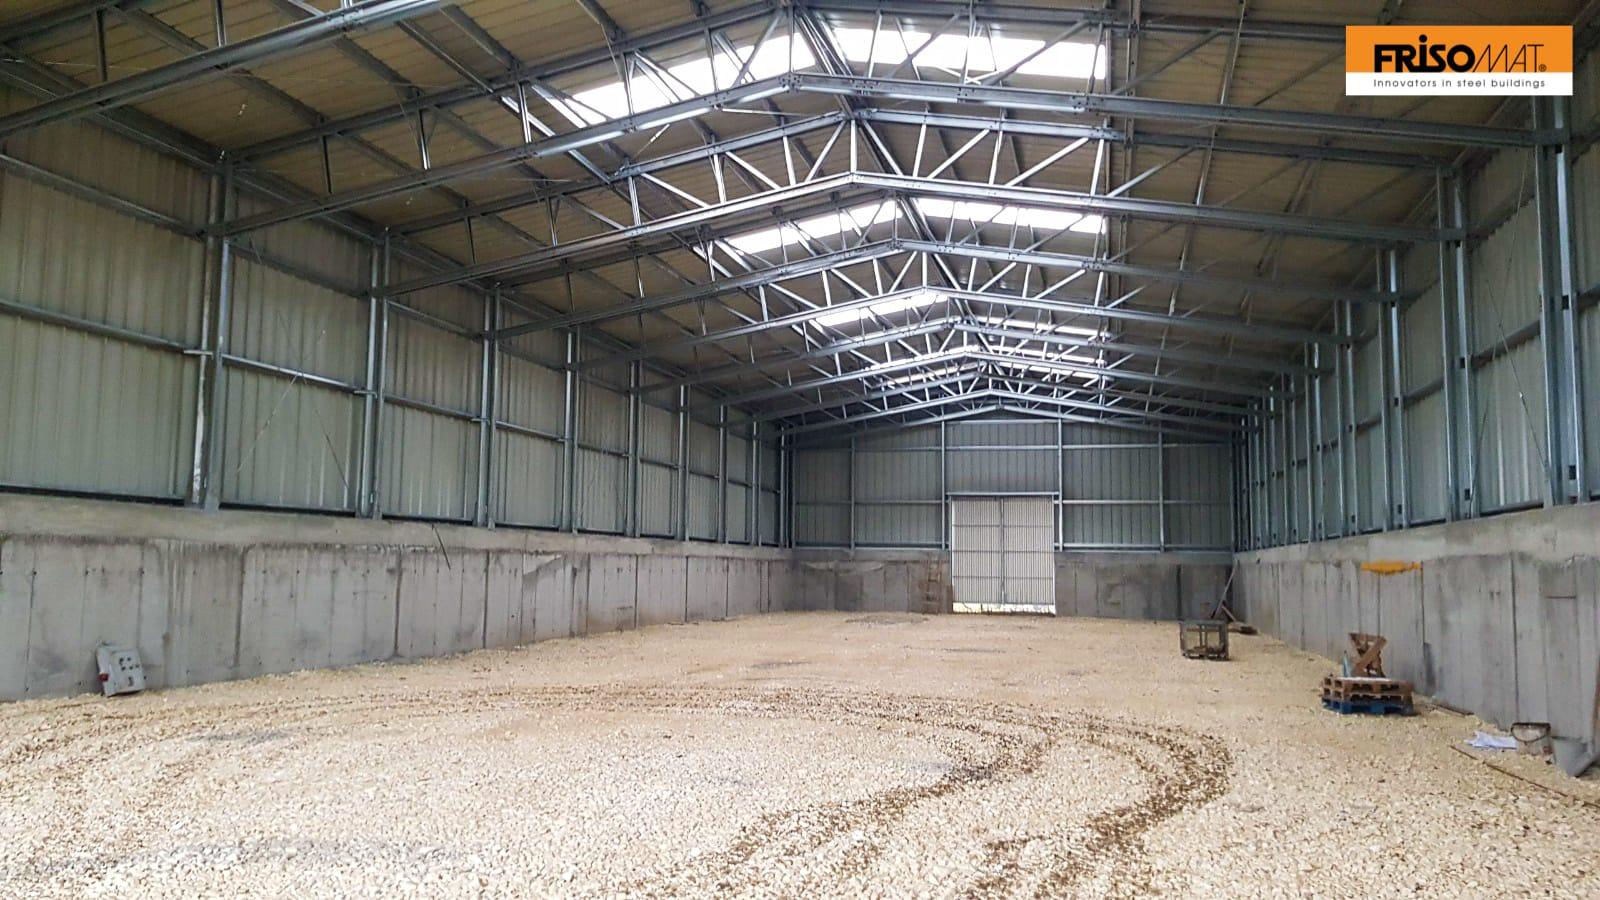 interior hala depozitare cereale socul beton frisomat